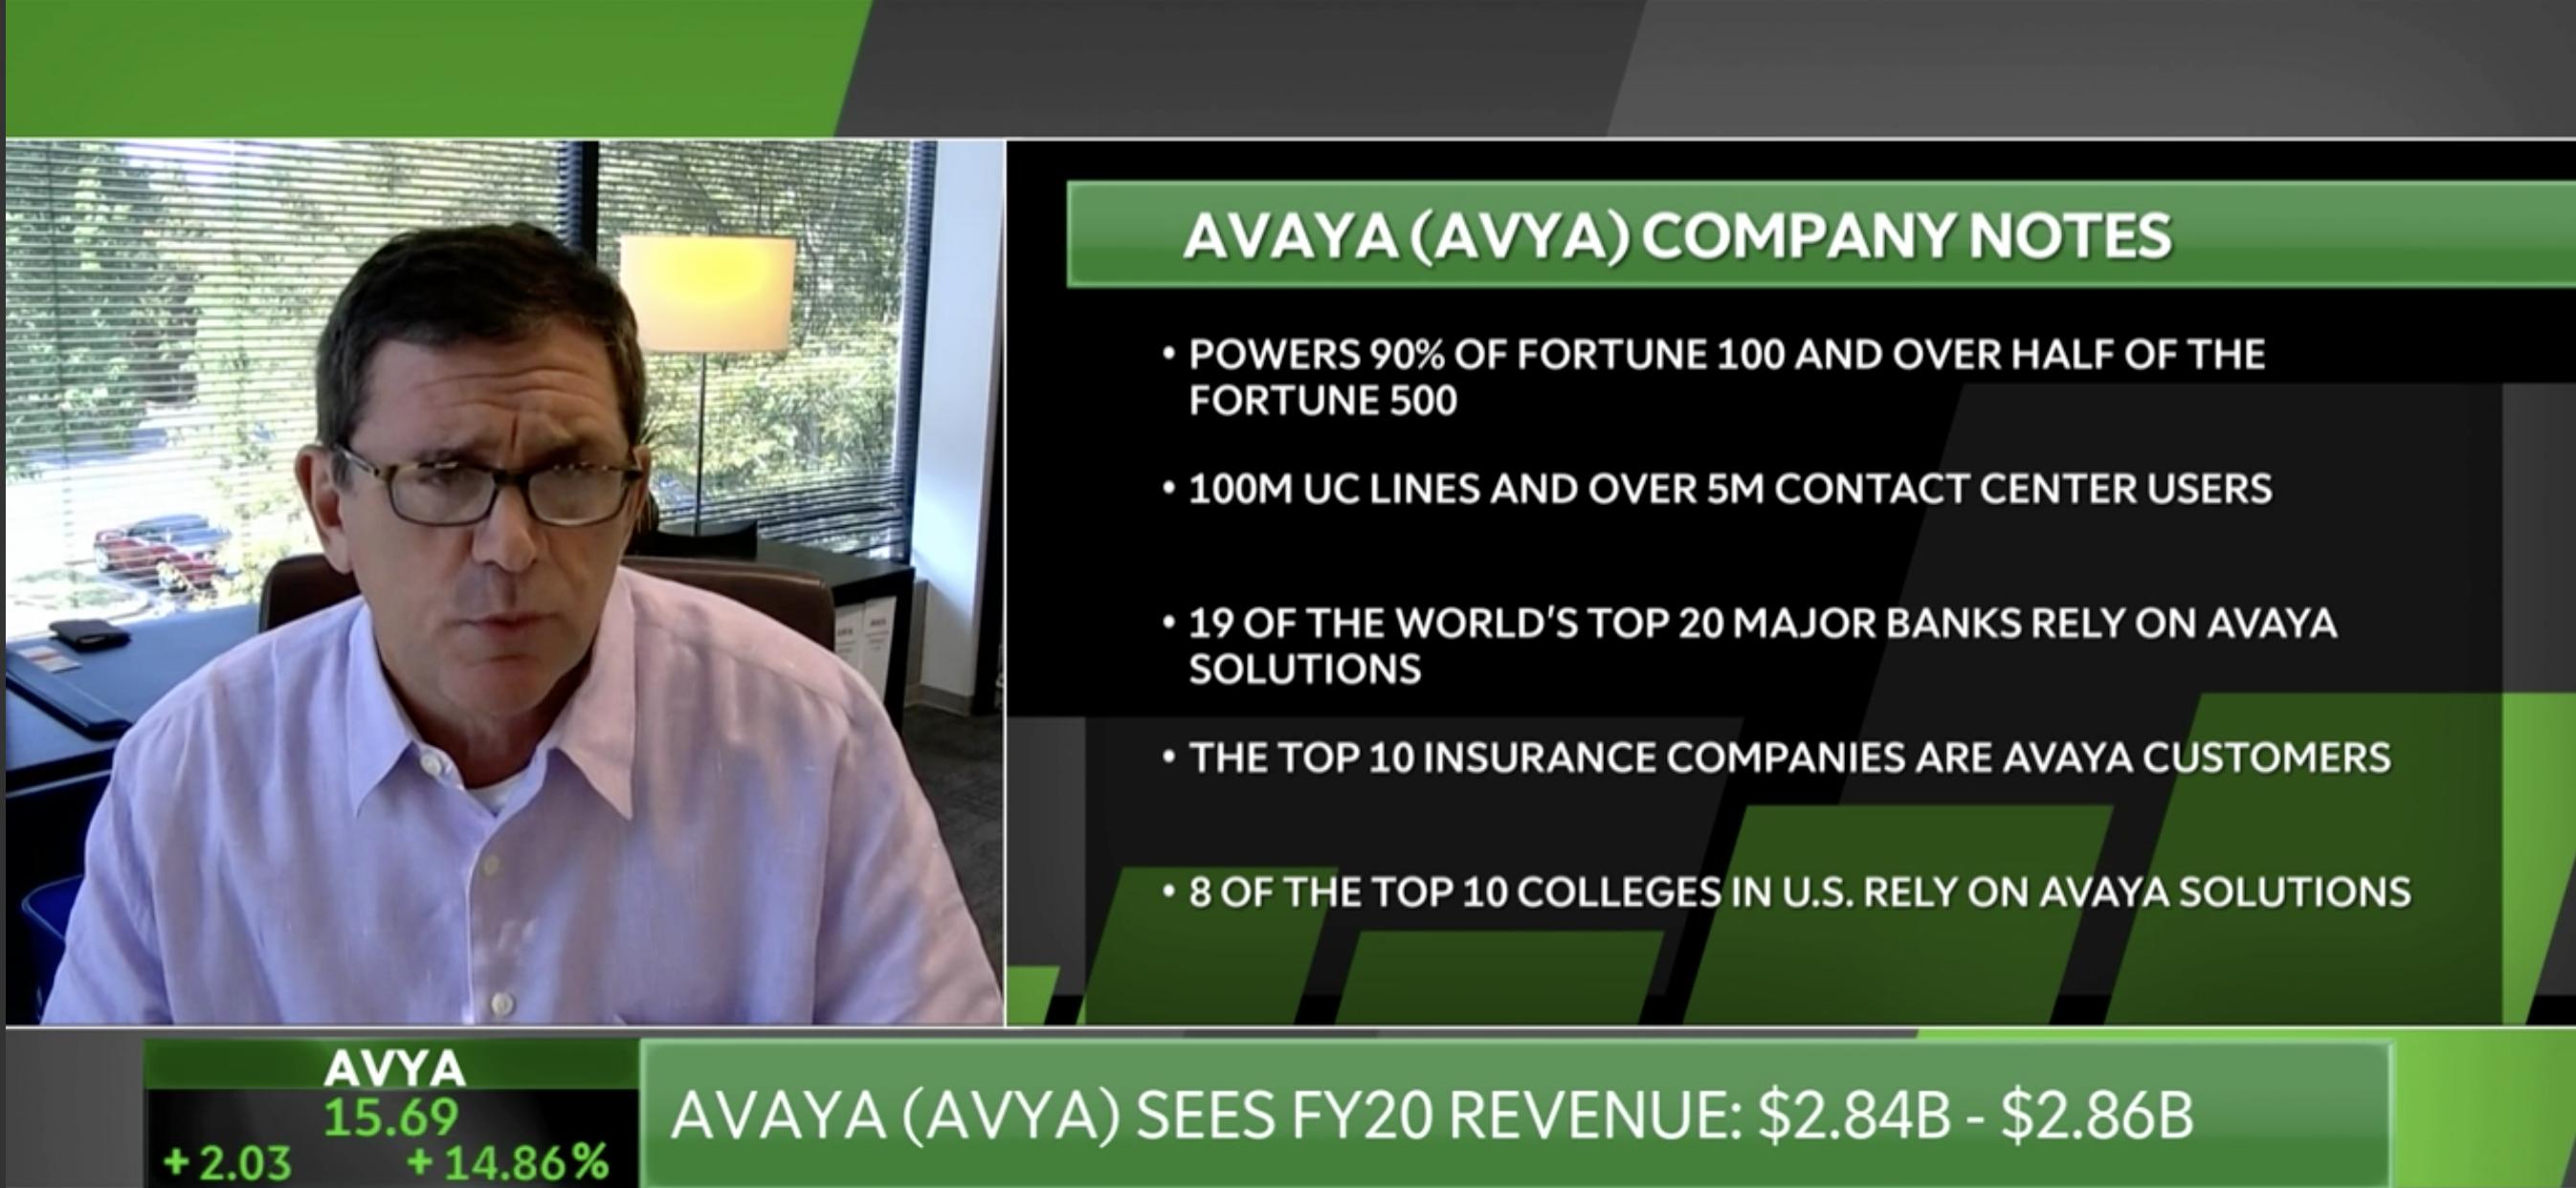 Avaya CEO Jim Chiricoon TDAmeritrade